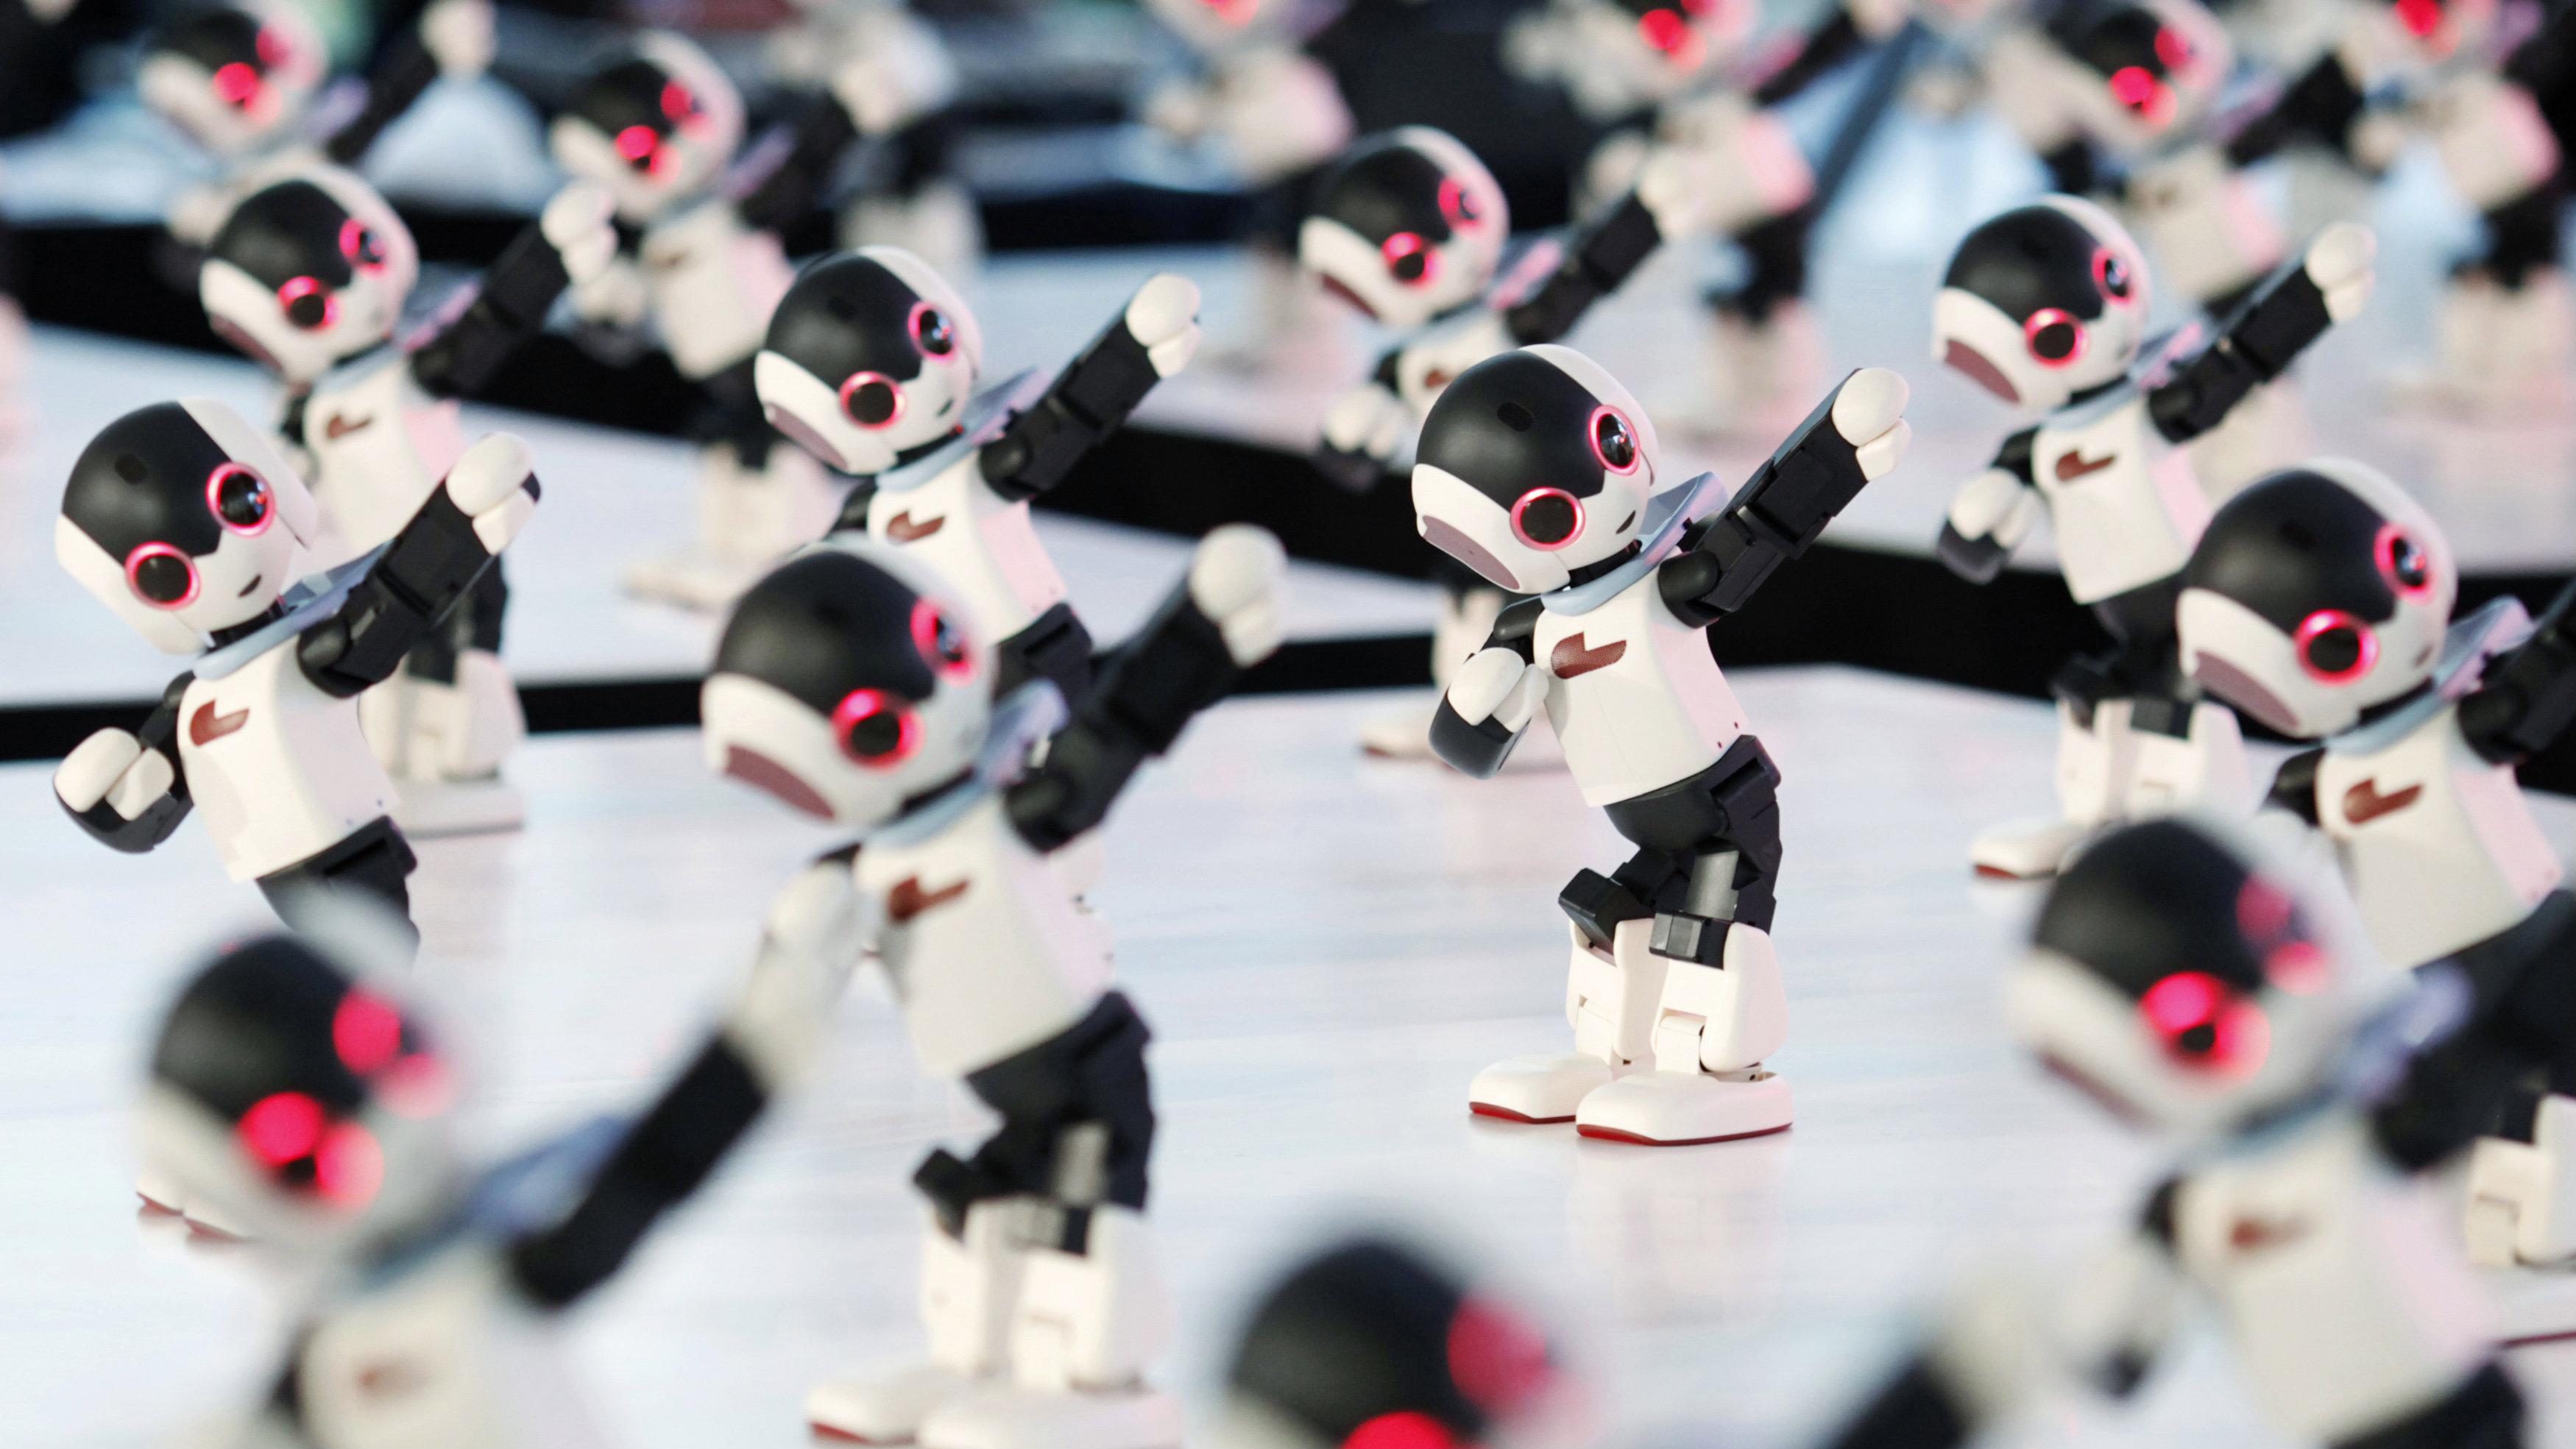 group of dancing robots